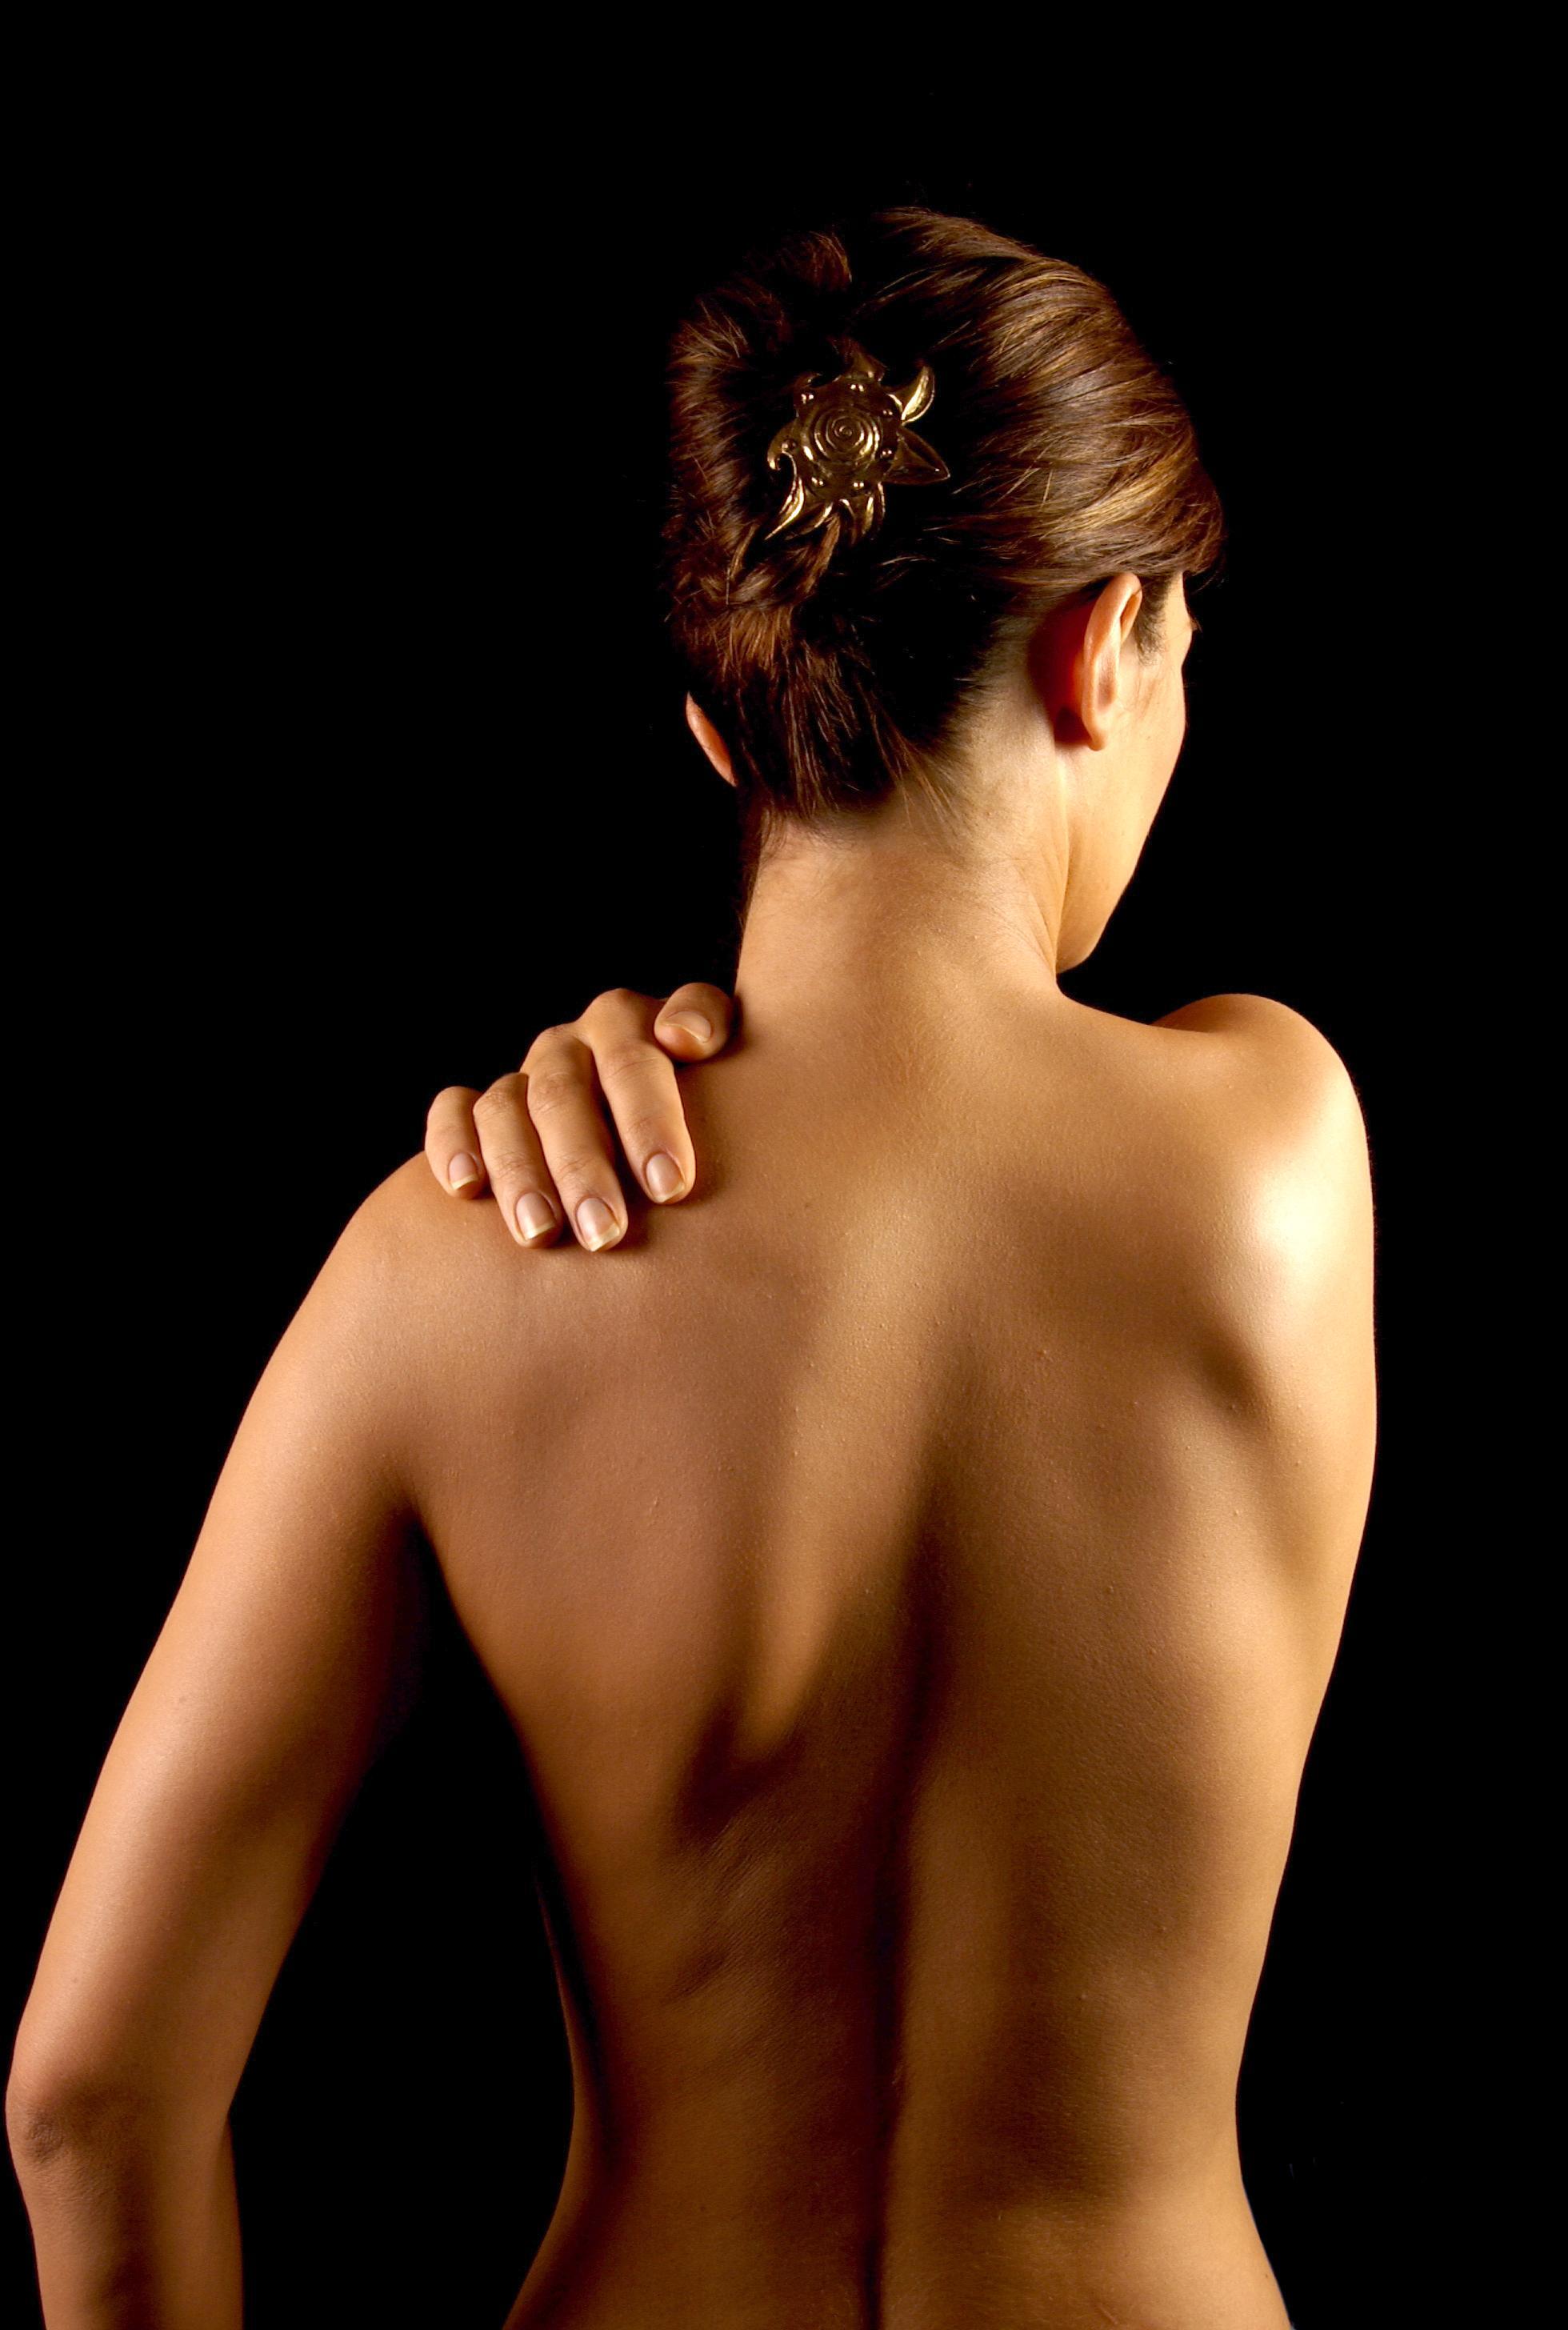 Henderson Shoulder Pain Doctor